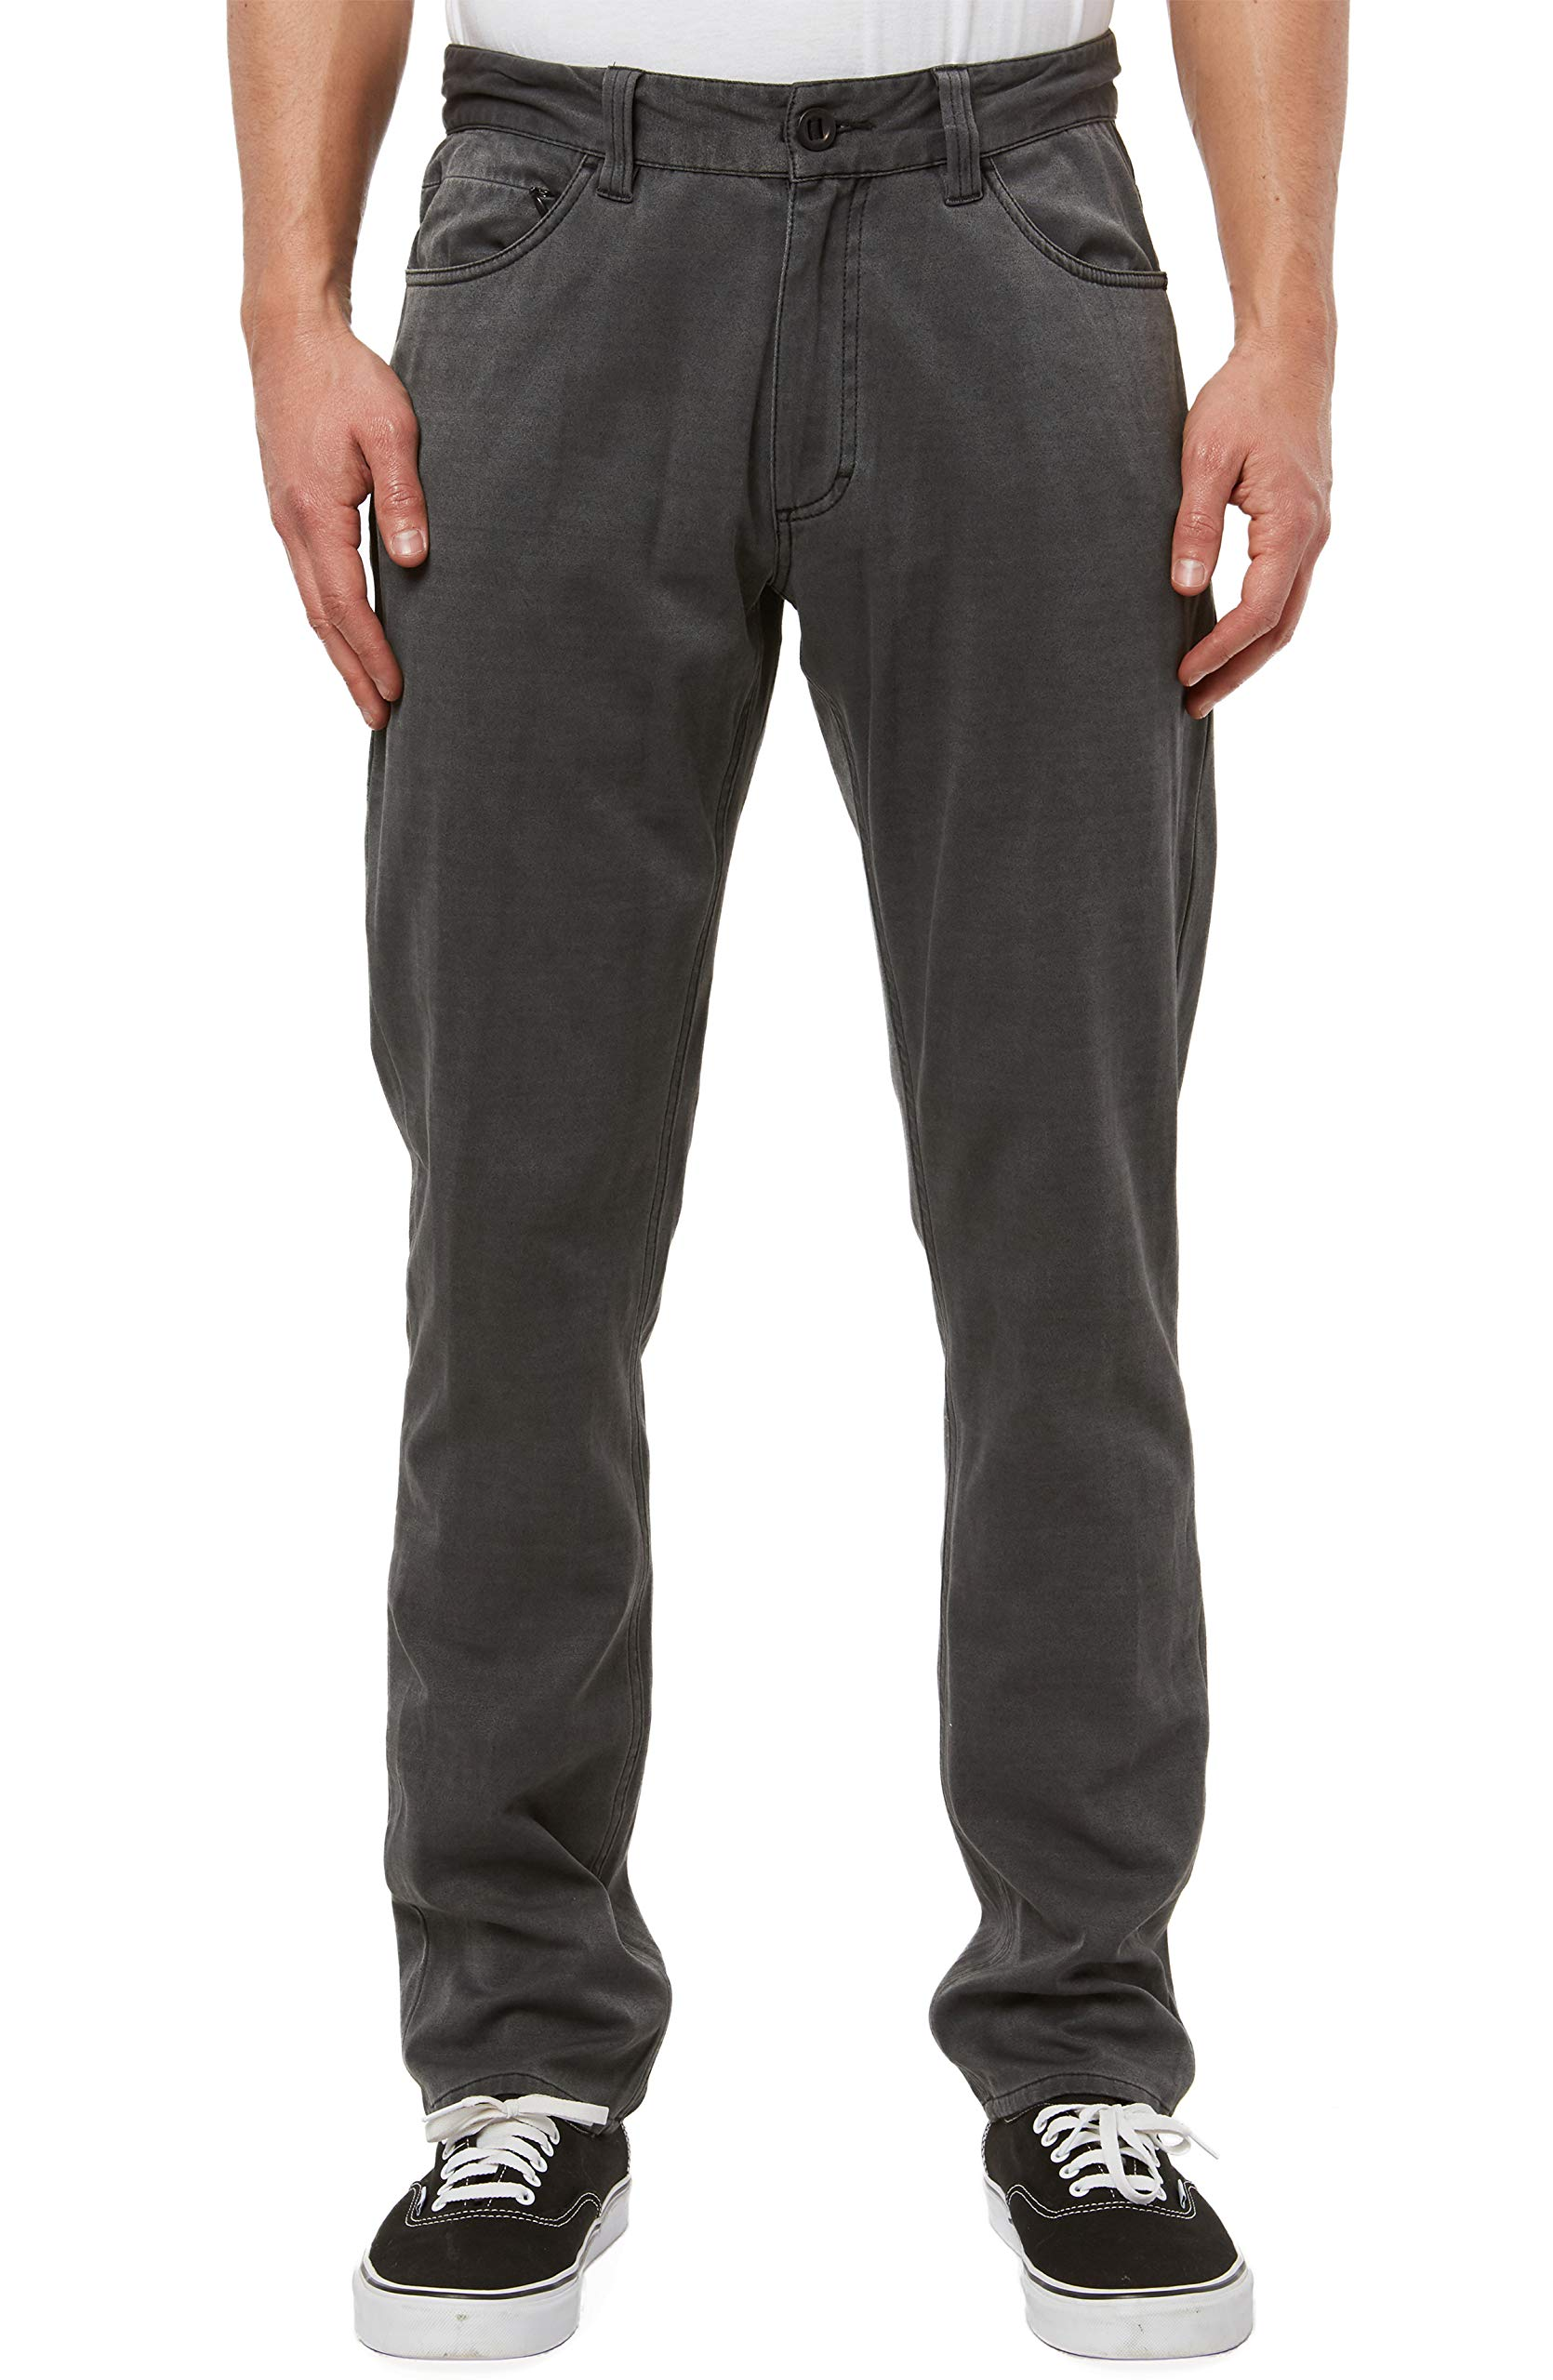 O'NEILL Men's Slim Fit 5 Pocket Hybrid Pant